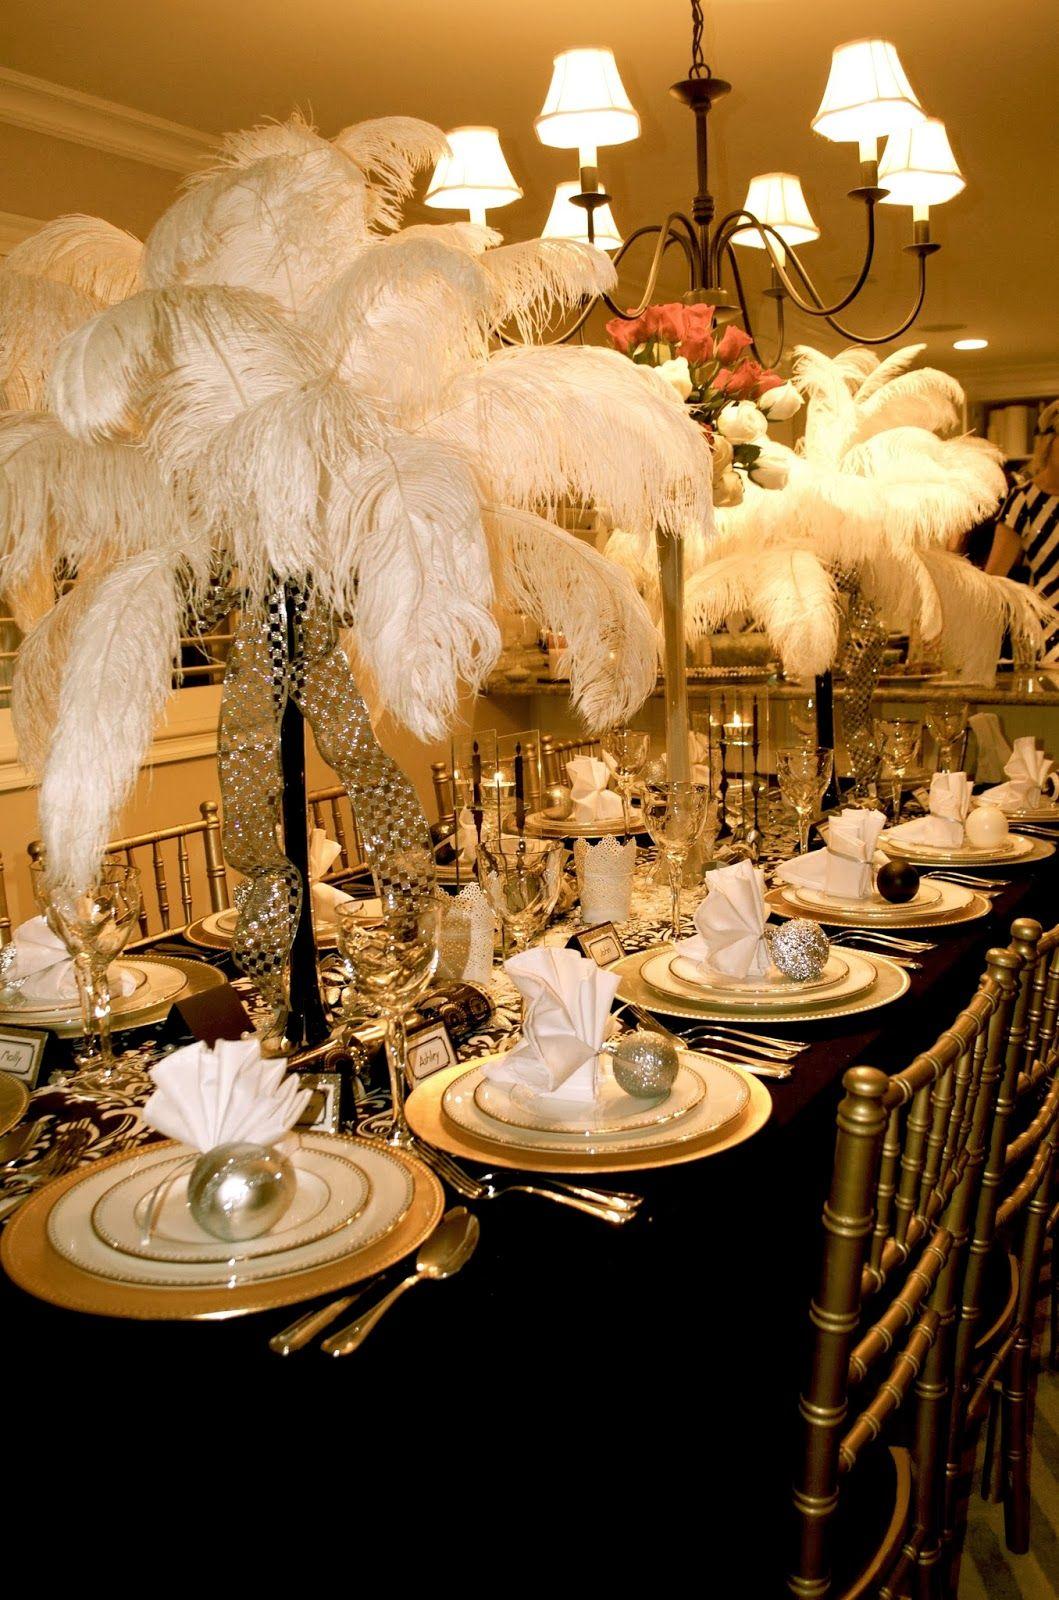 The Great Gatsby Wedding Inspiration: Dessert Table